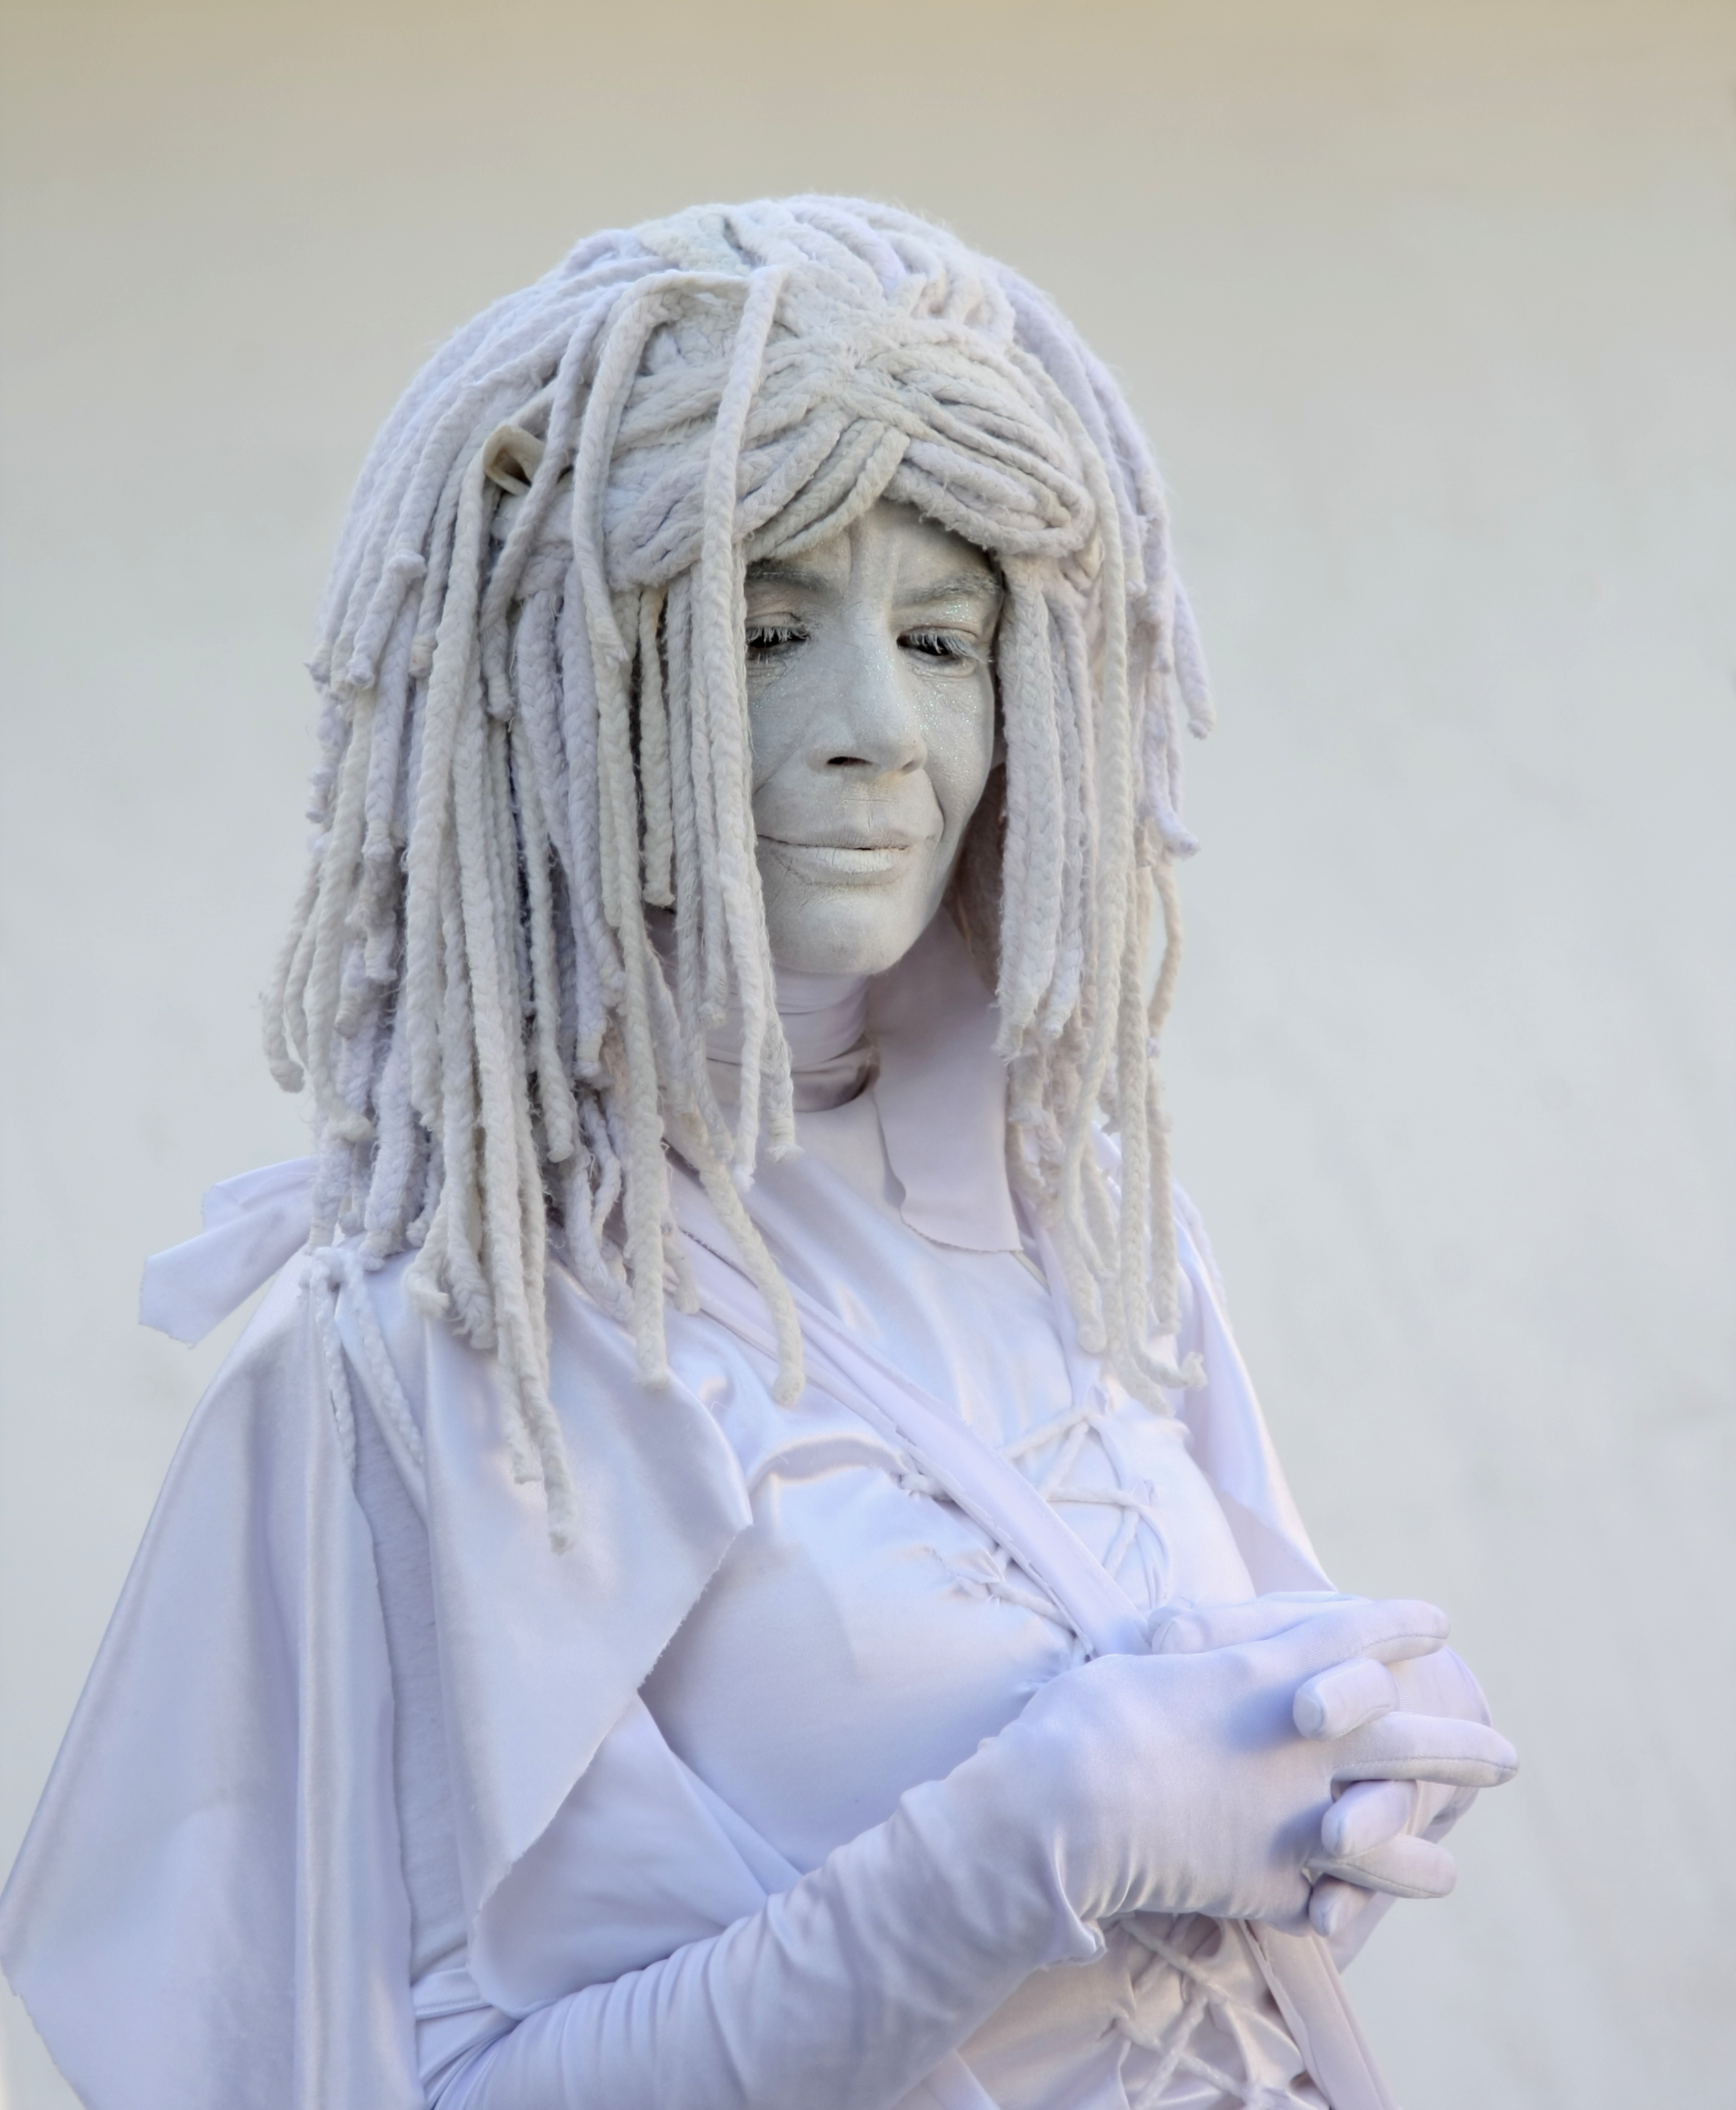 File:Living statue, Miami Beach, FL.jpg - Wikimedia Commons